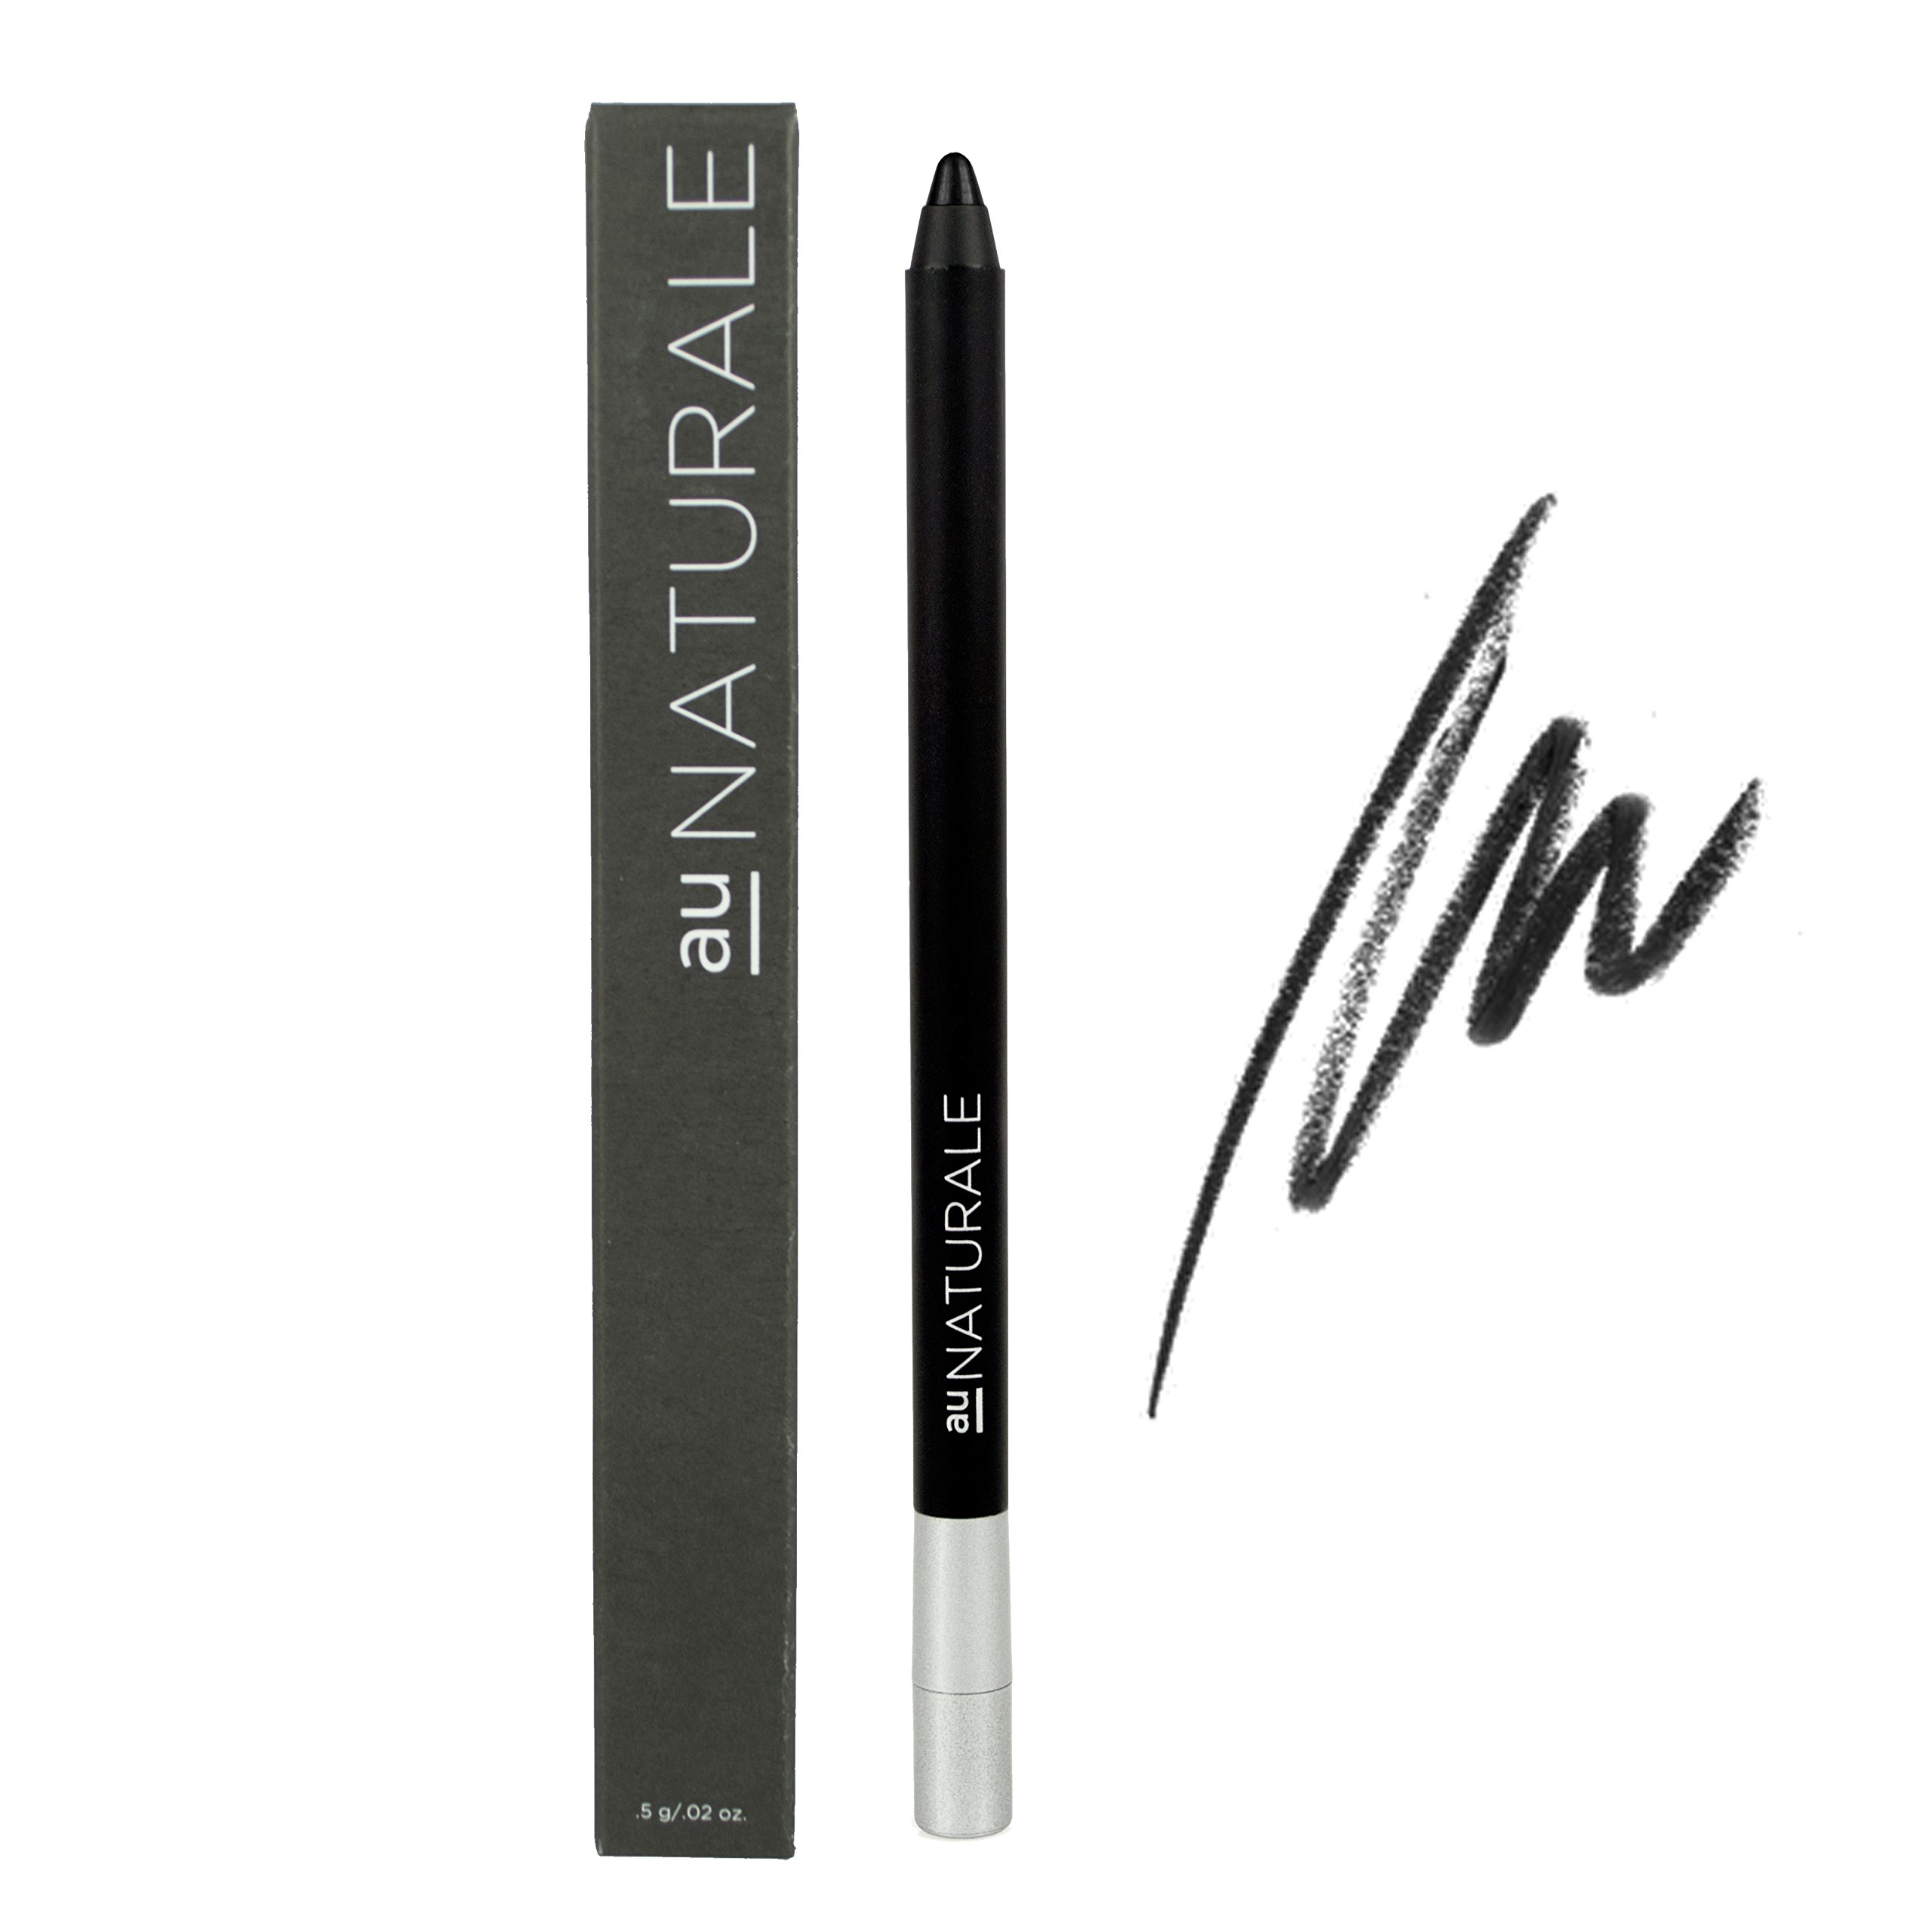 Au Naturale Organic Eye Liner Pencil in Night | Made in the USA | Organic | Vegan | Cruelty-free